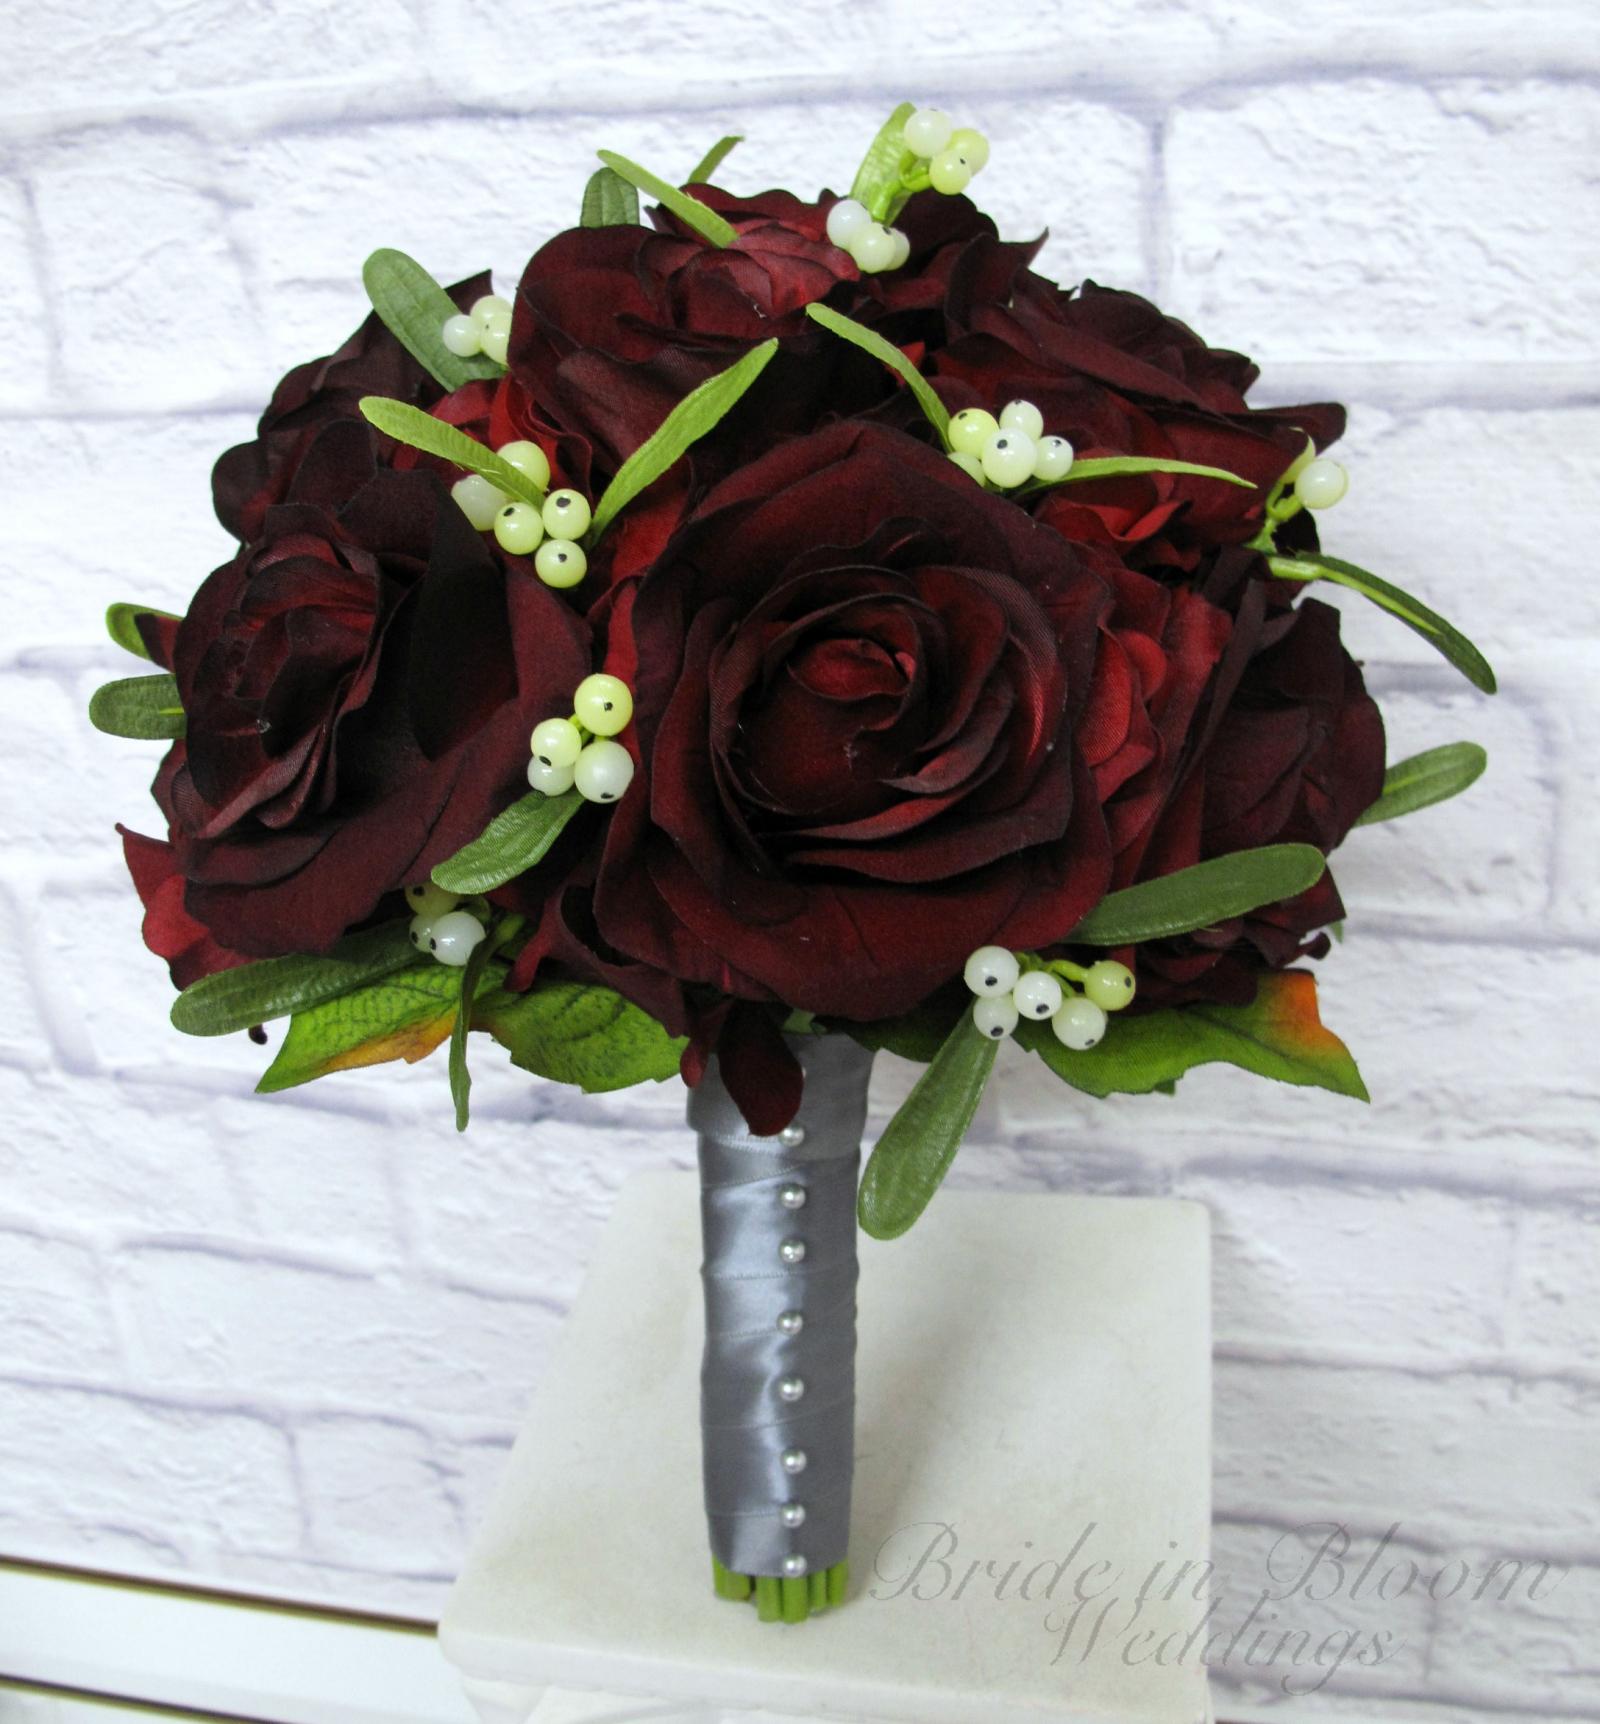 velvet red rose bride bouquet black baccara roses mistletoe wedding bouquet